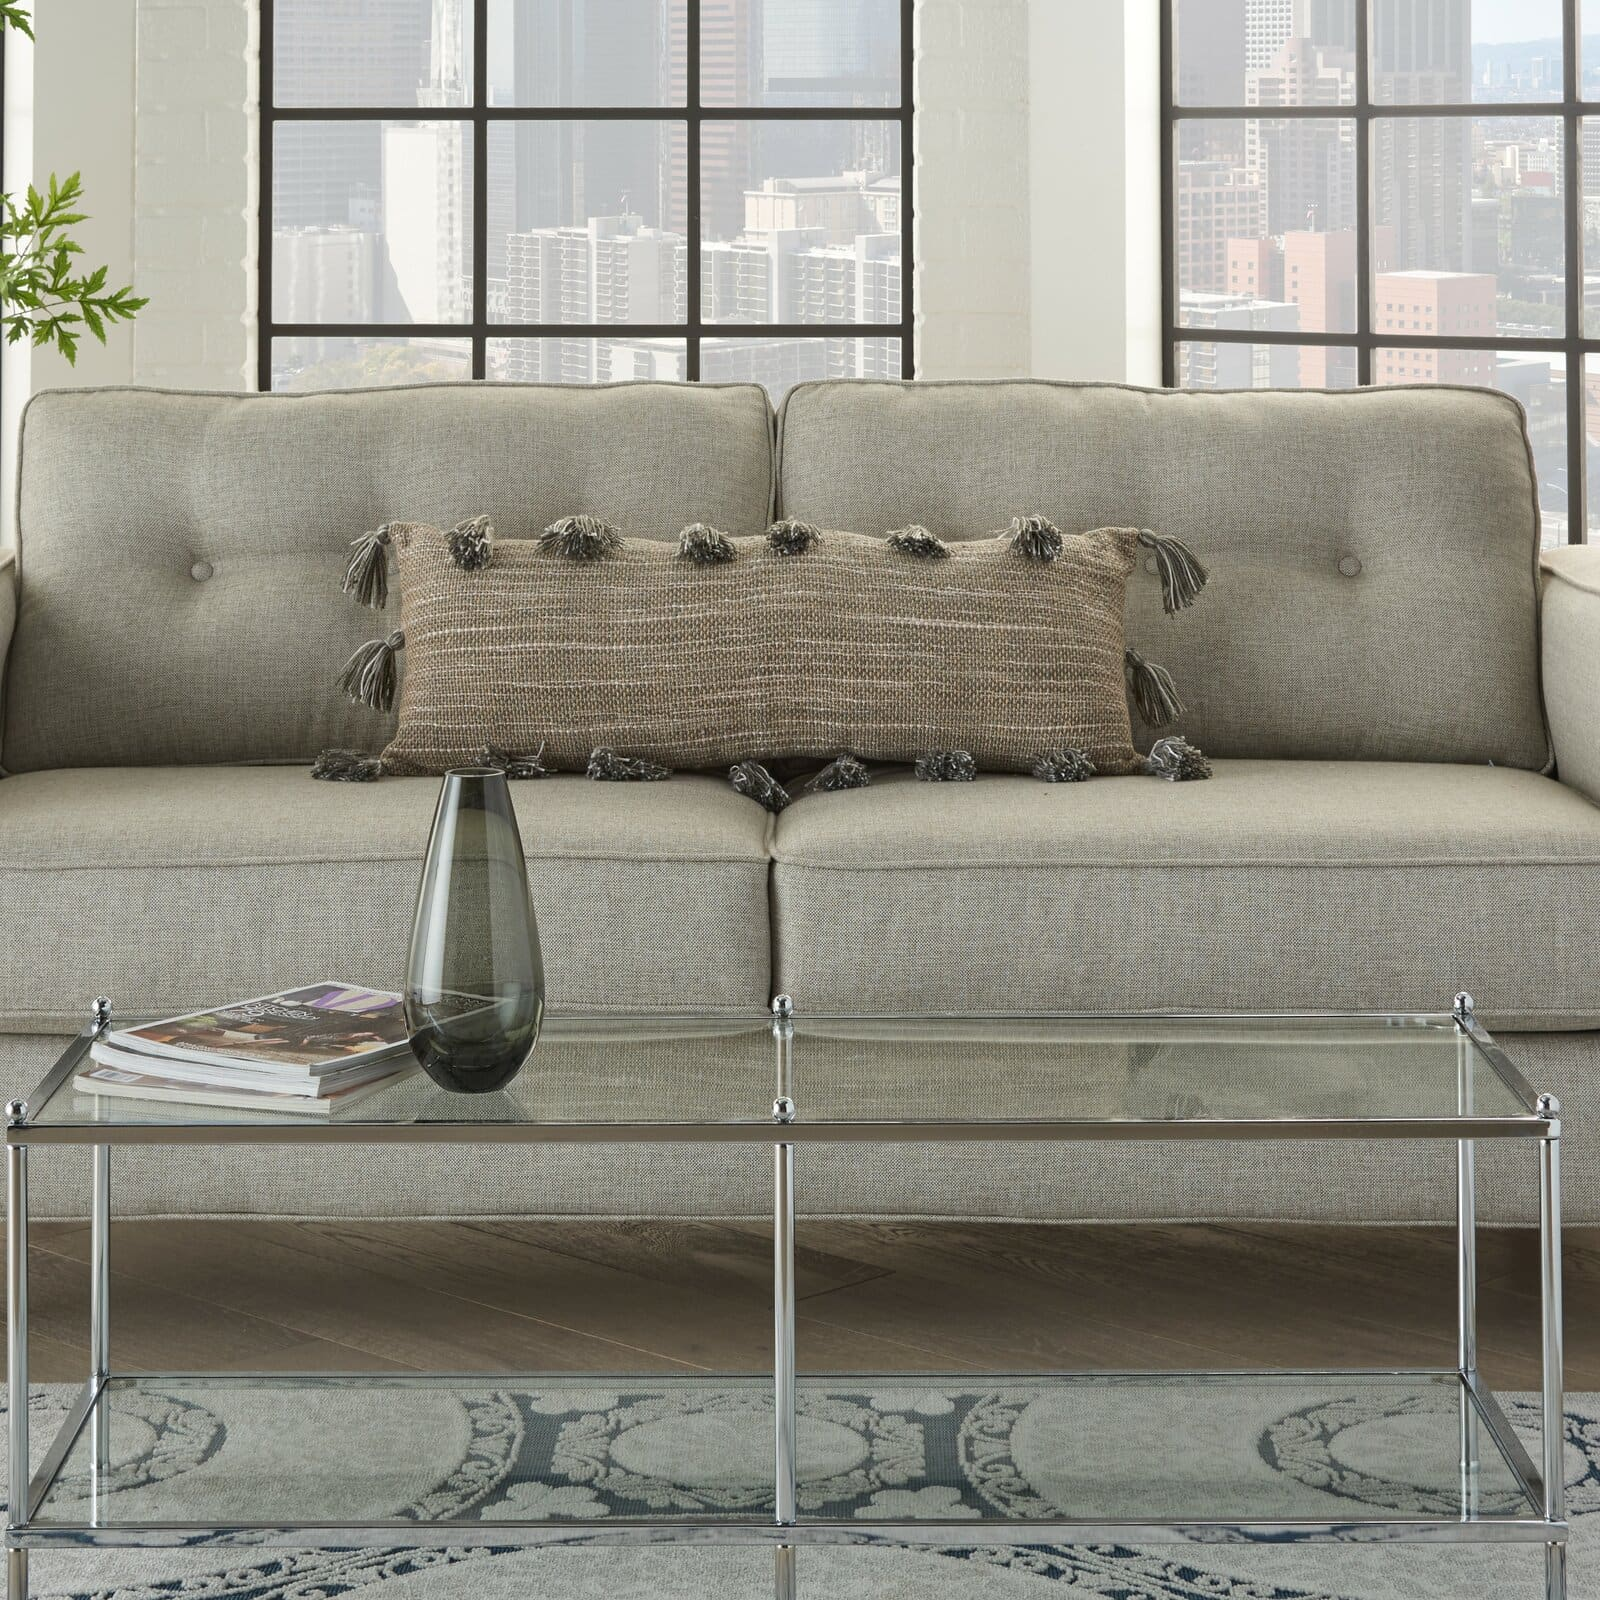 Add Some Fun to a Plain Grey Sofa With Tassels